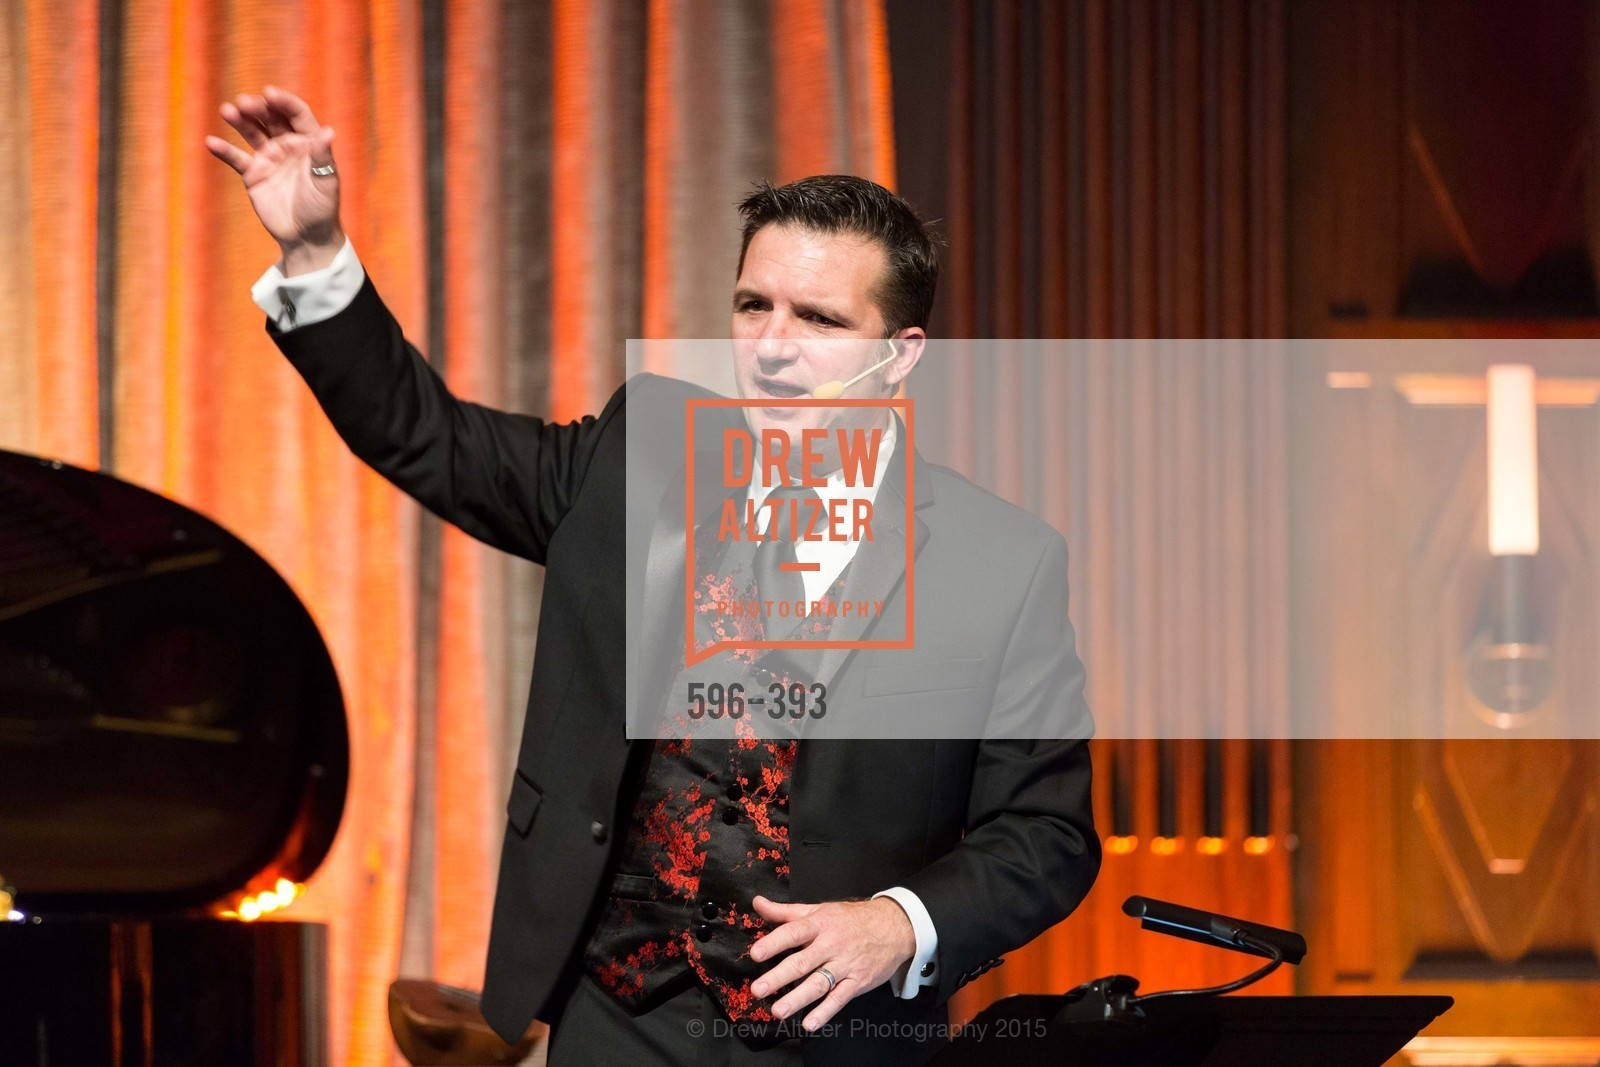 Greg Quiroga, San Francisco Performances' 36th Season Gala, Merchants Exchange Building, Julia Morgan Ballroom. 465 California St, San Francisco, CA 94104, October 16th, 2015,Drew Altizer, Drew Altizer Photography, full-service event agency, private events, San Francisco photographer, photographer California